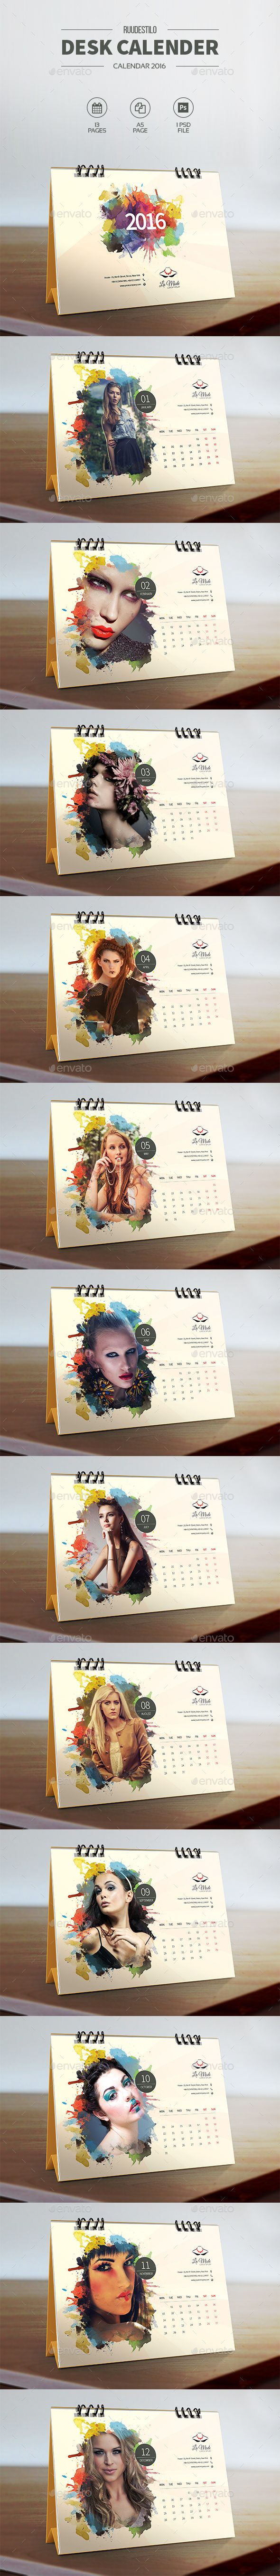 Desk Calendar 2016 Template PSD. Download here: http://graphicriver.net/item/desk-calendar-2016/14166030?ref=ksioks